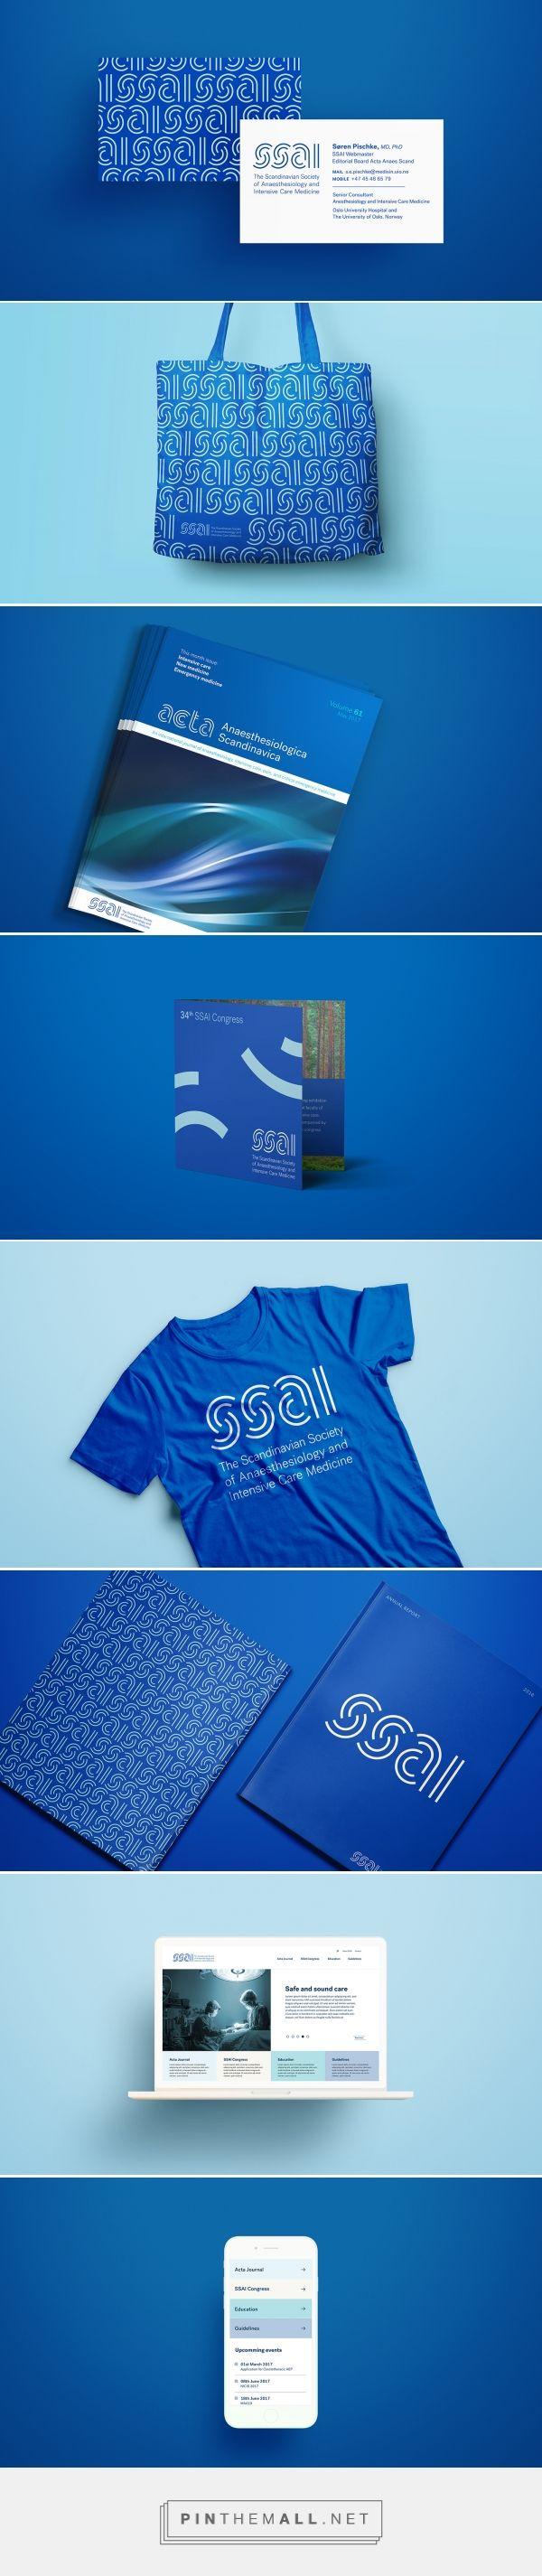 Ssai Medical Branding by Tank Design | Fivestar Branding Agency – Design and Branding Agency & Curated Inspiration Gallery